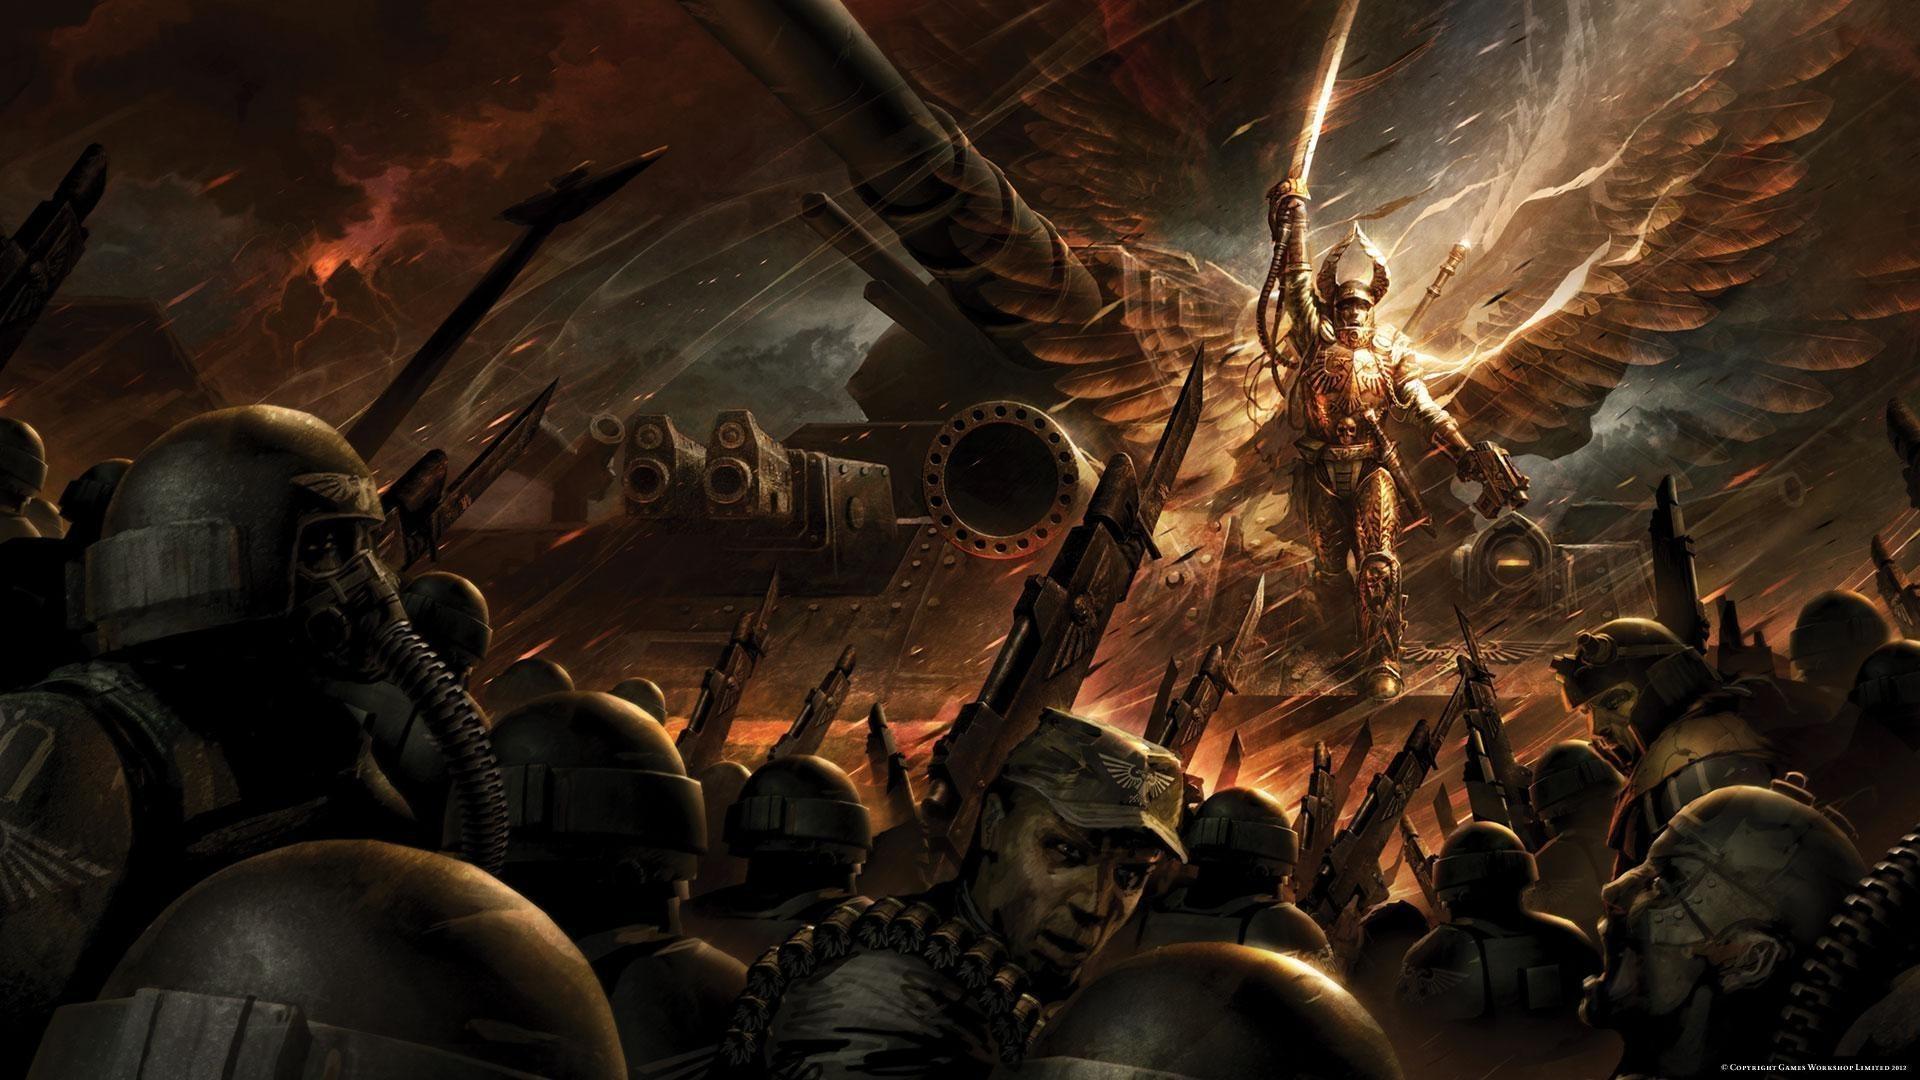 Warhammer 40K Crossover Comp | franchises, warhammer 40000 | ваха |  вархаммер 40к | Pinterest | Crossover, Warhammer 40k and Warhammer 40K